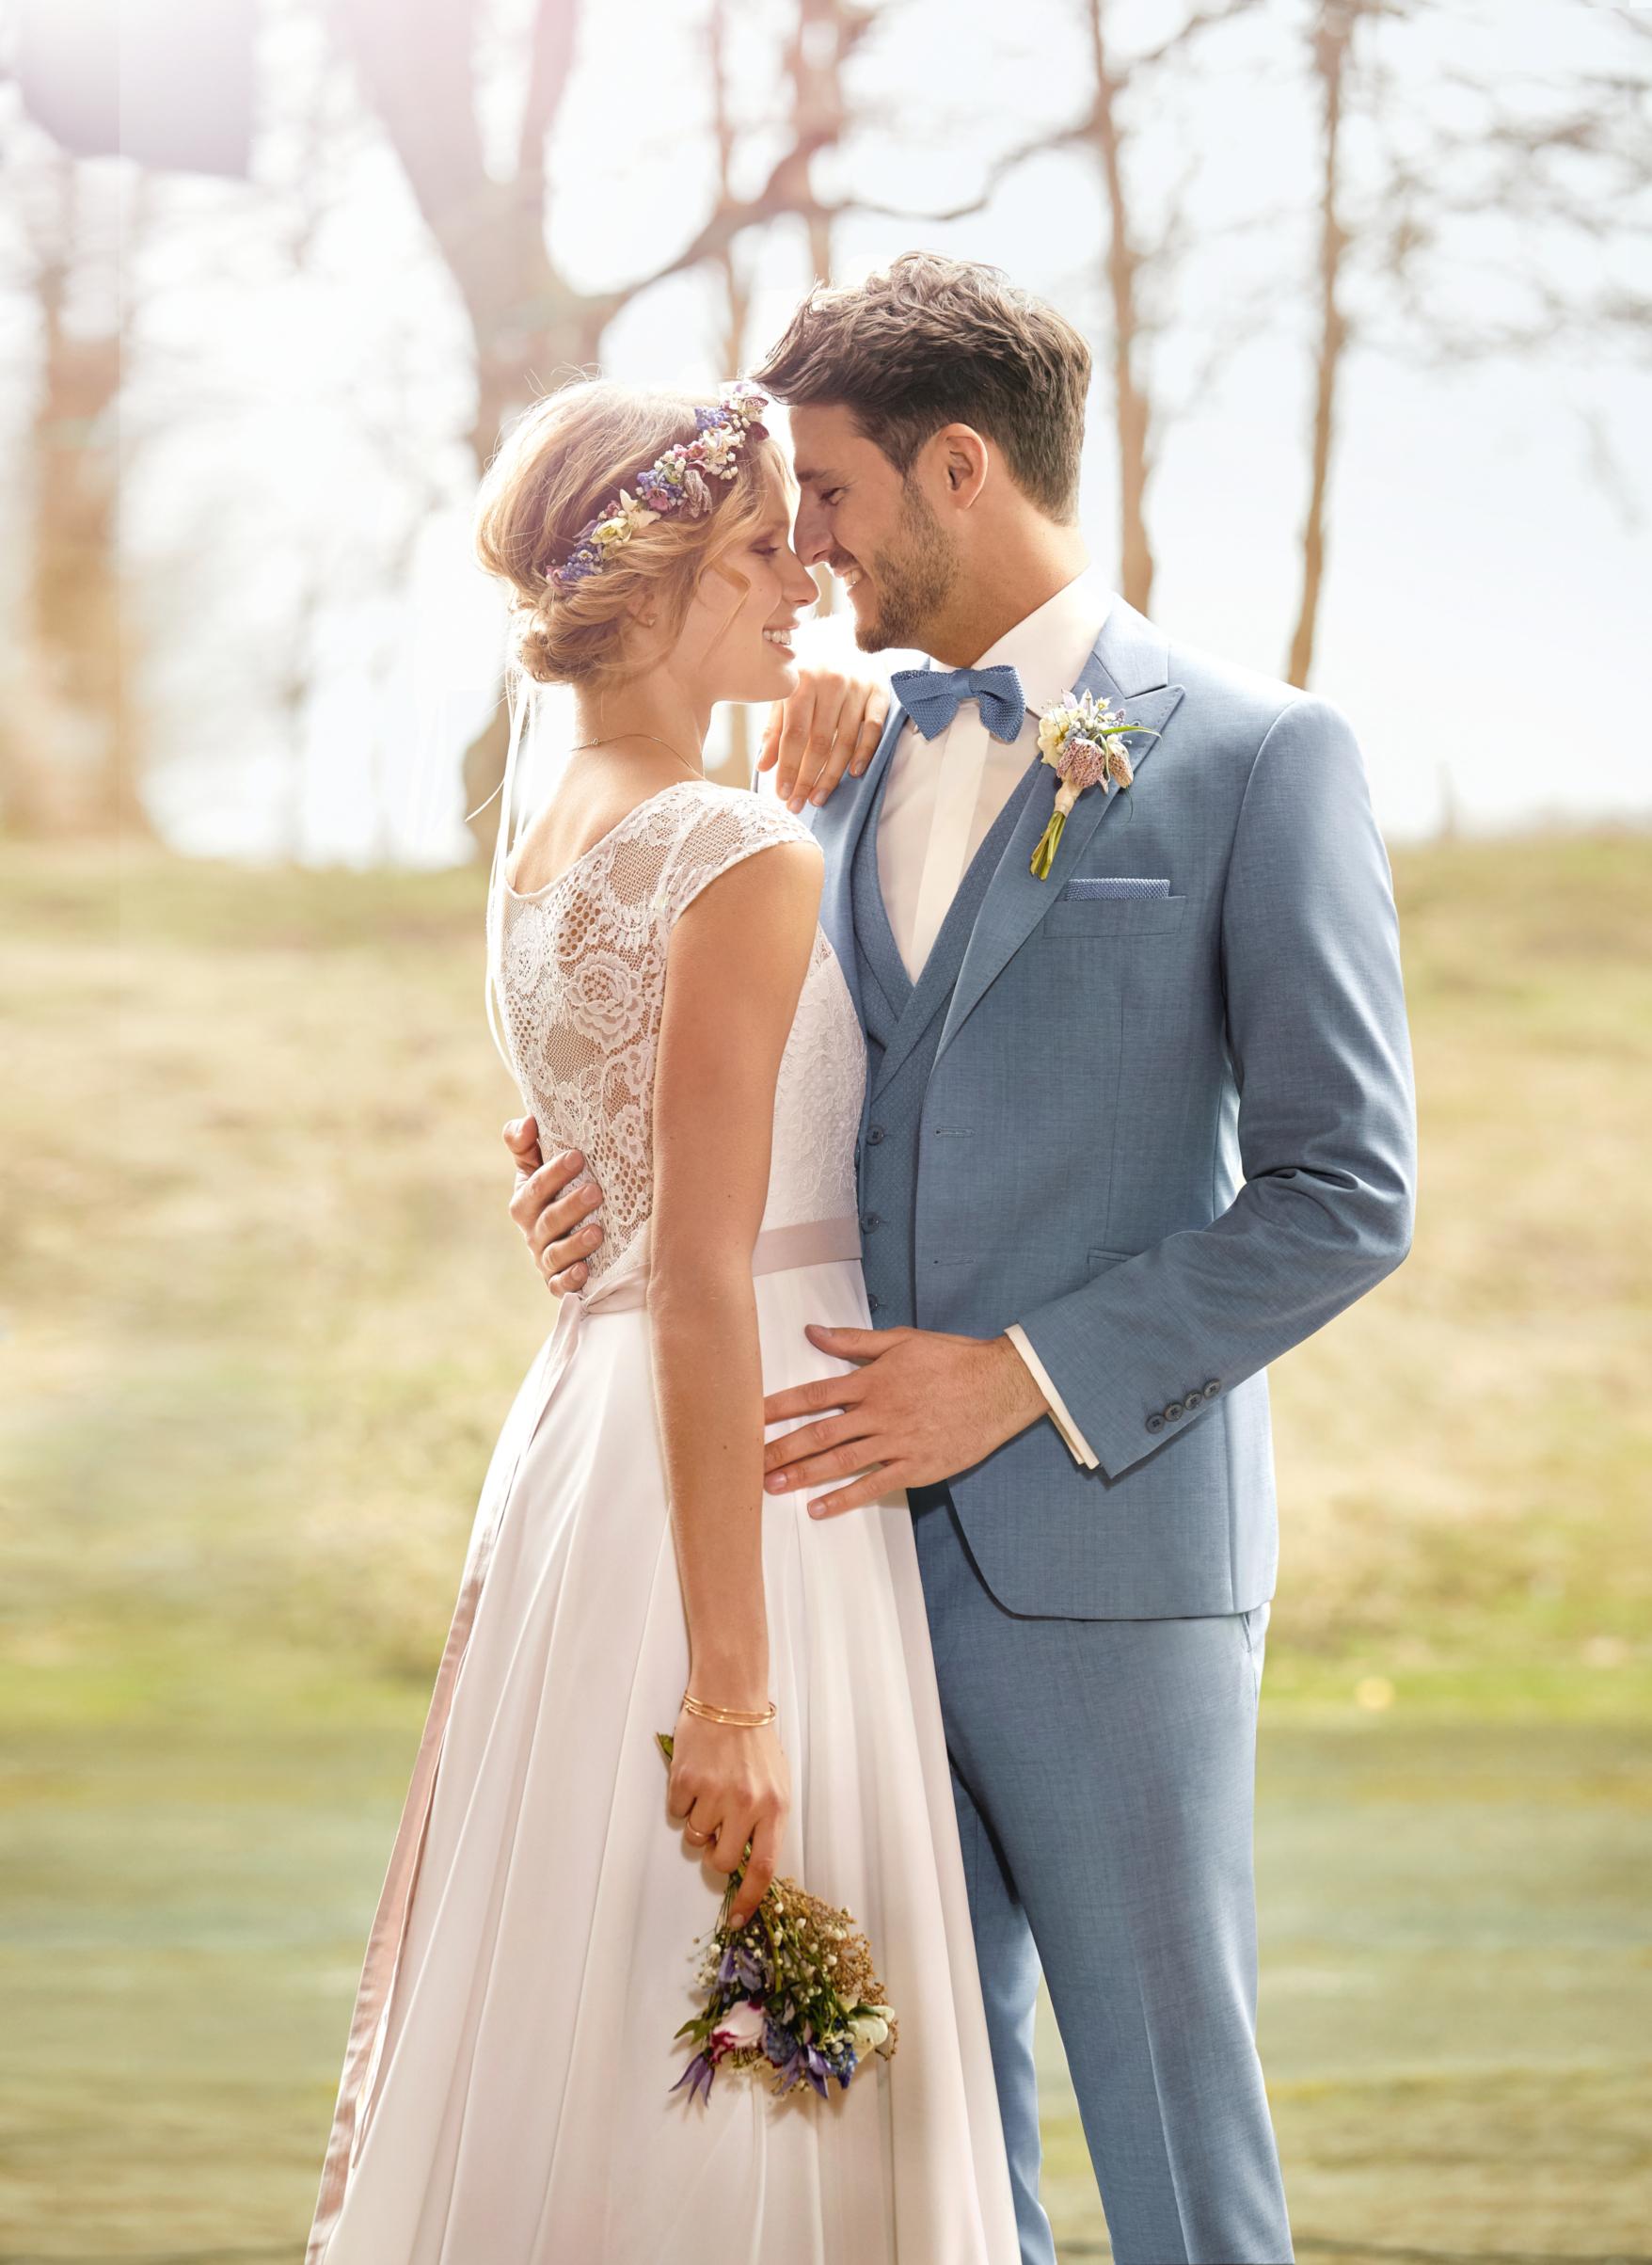 2019 Vőlegényi öltöny modelljei